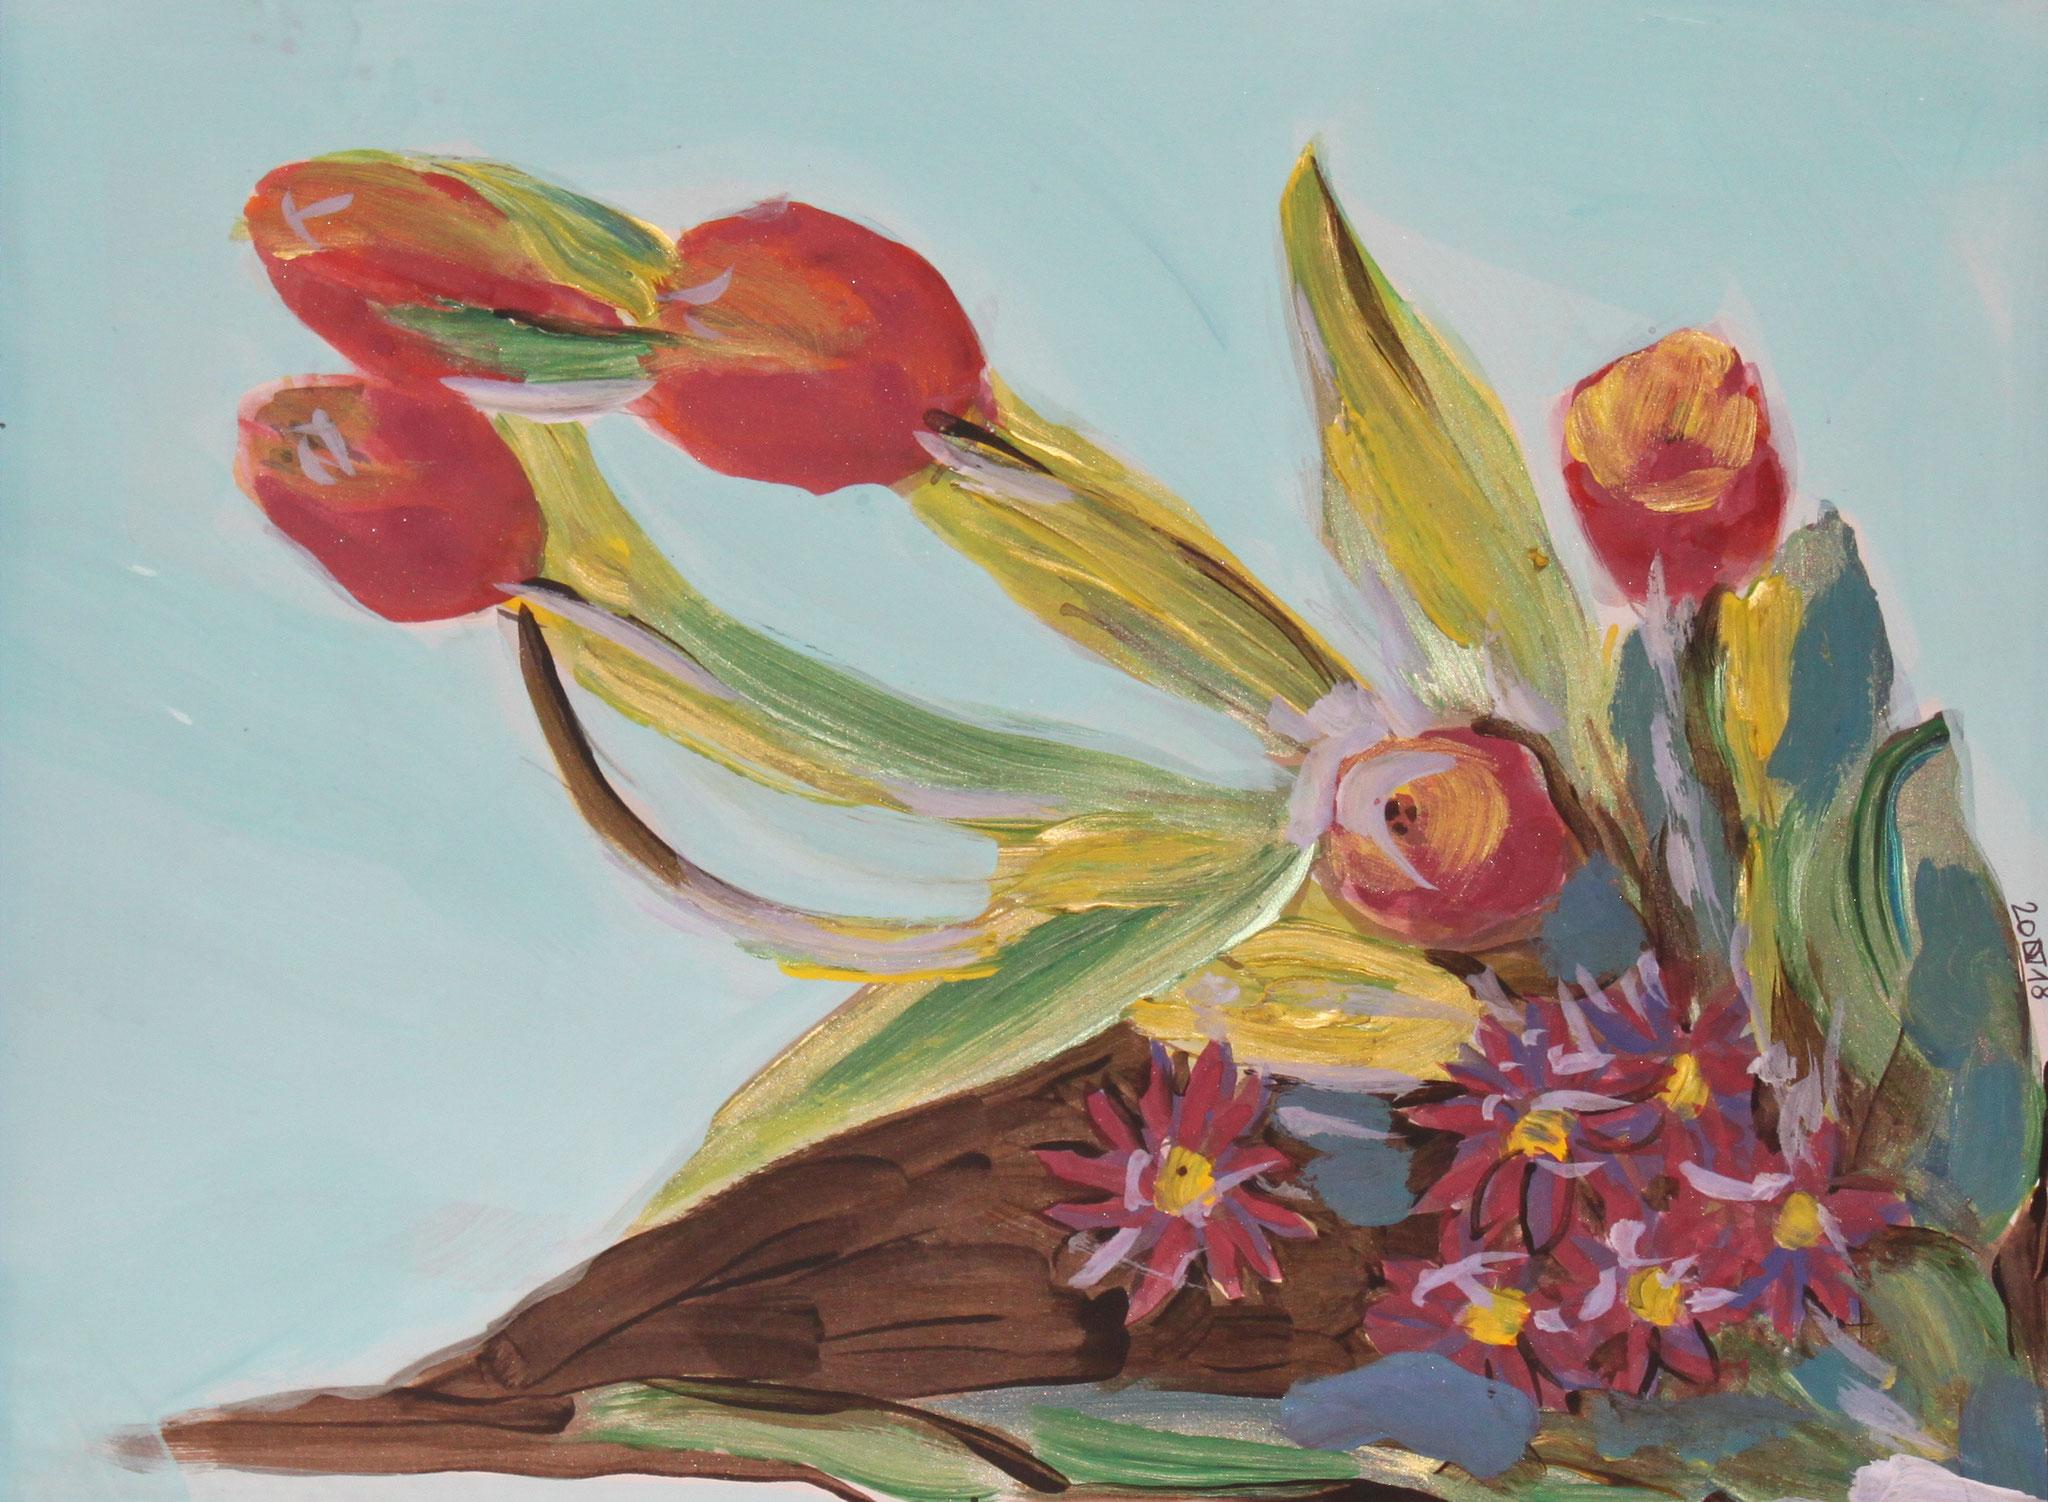 Tulpen, 2018, Gouache und Aquarell auf Papier, 30 cm x 42 cm